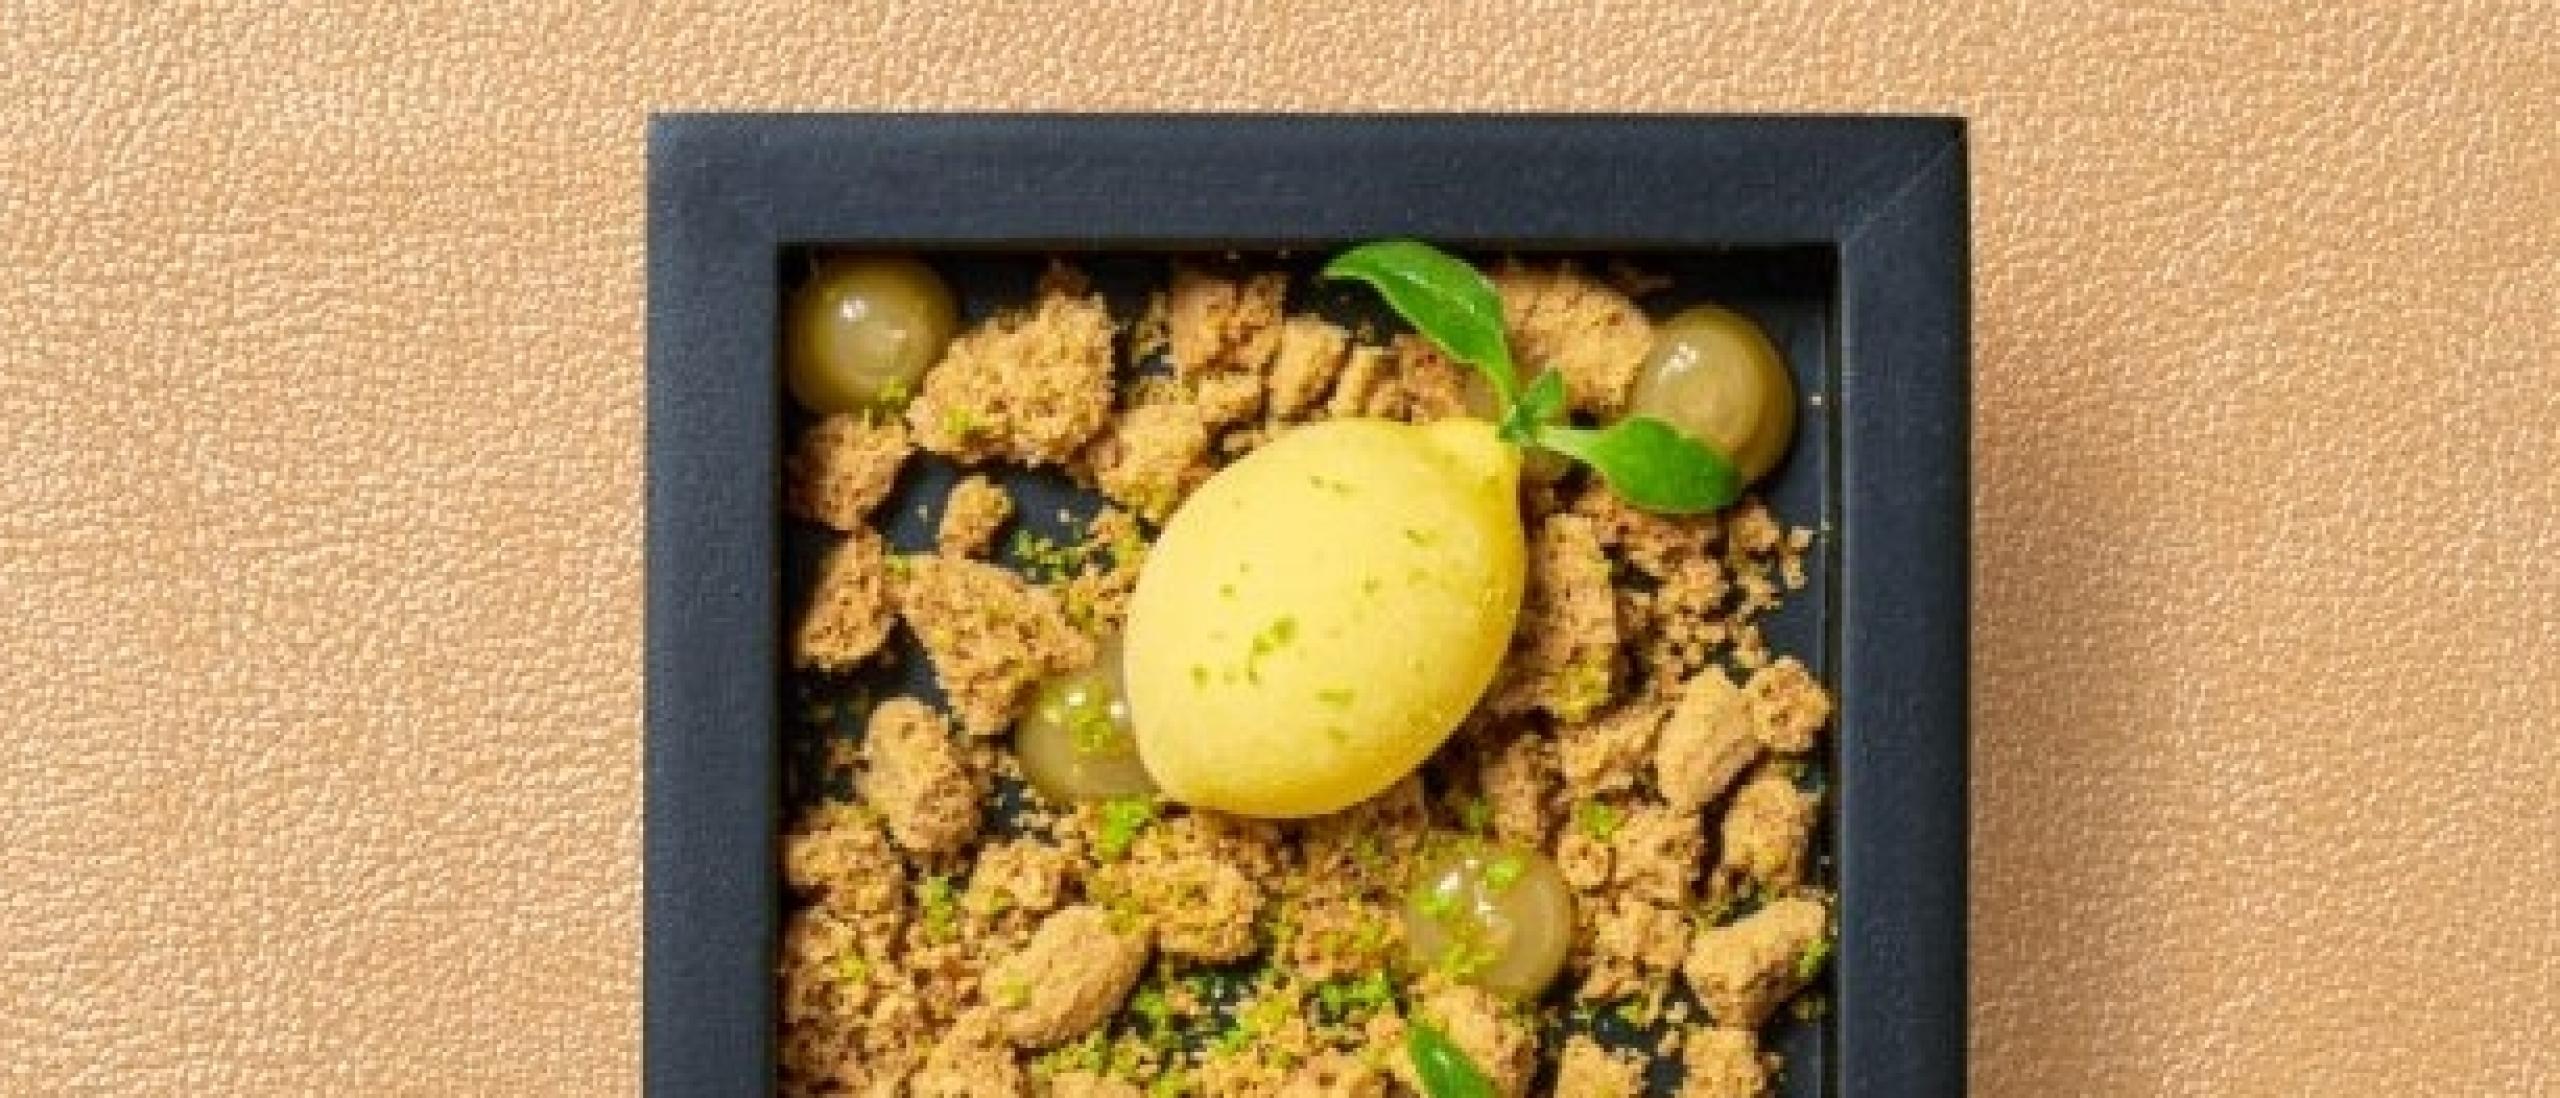 Serveer Limoncello-tjes als snackdessert